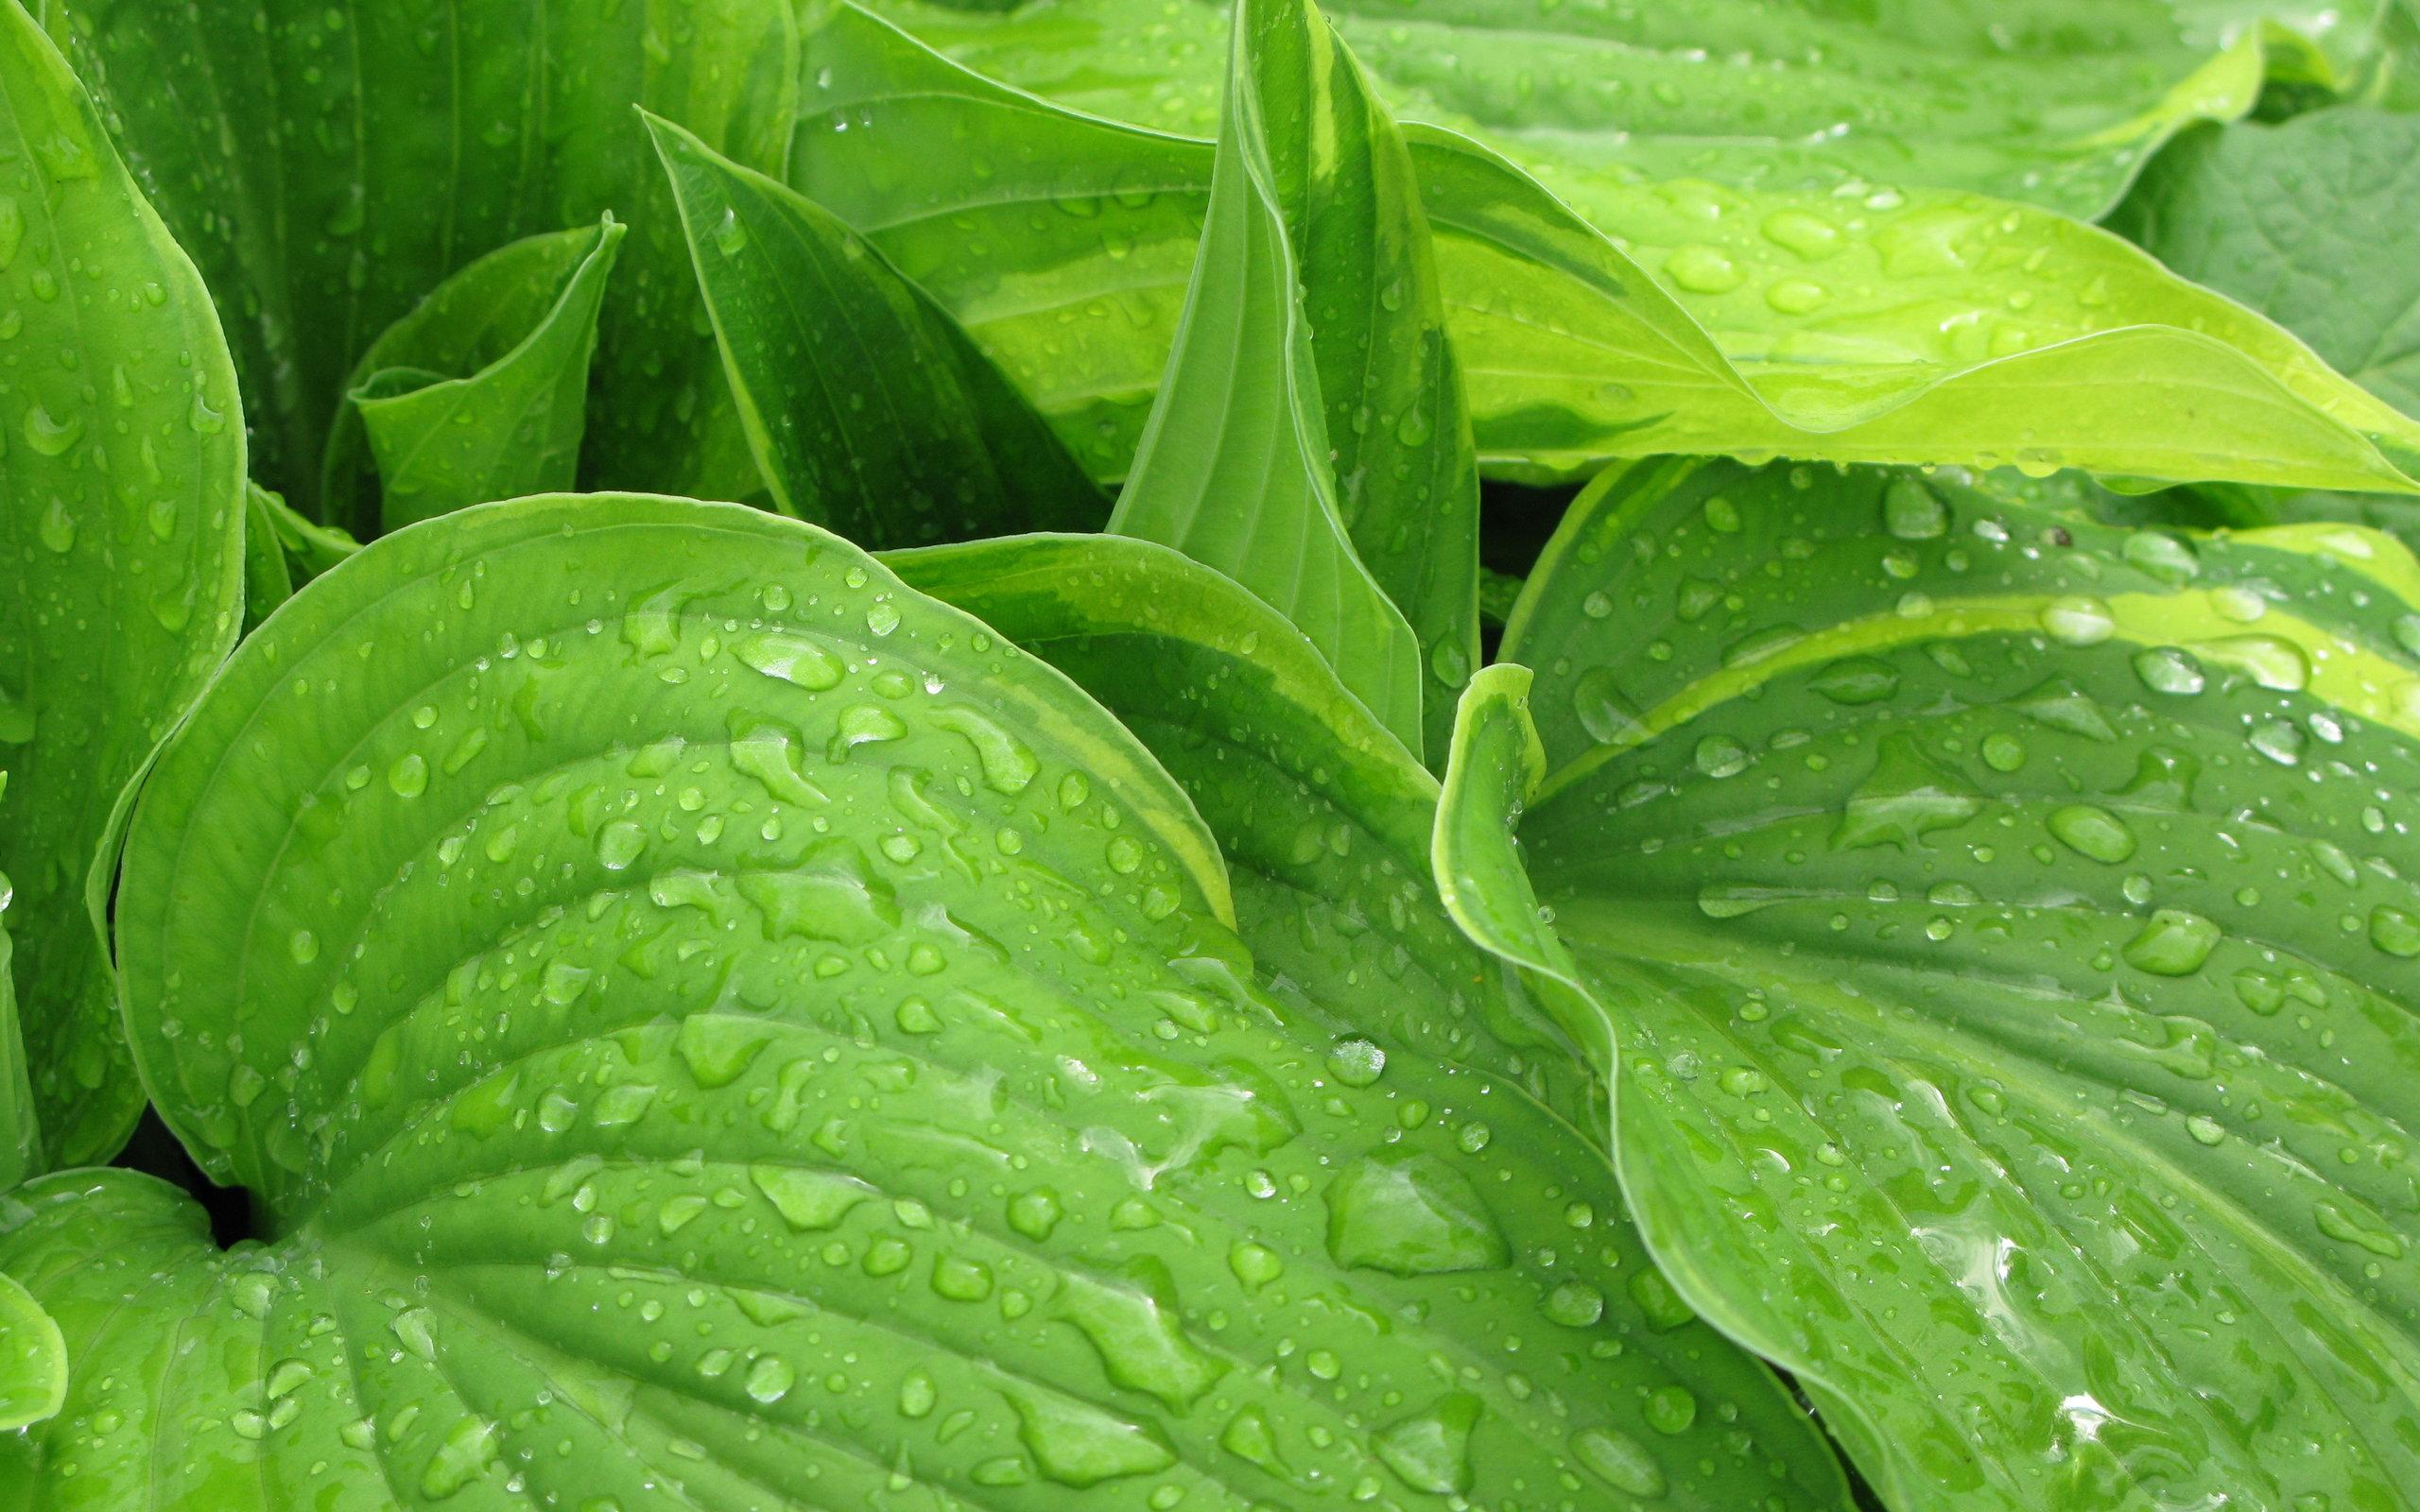 rain leaves nature plants wallpapers hd 4k desktop cut